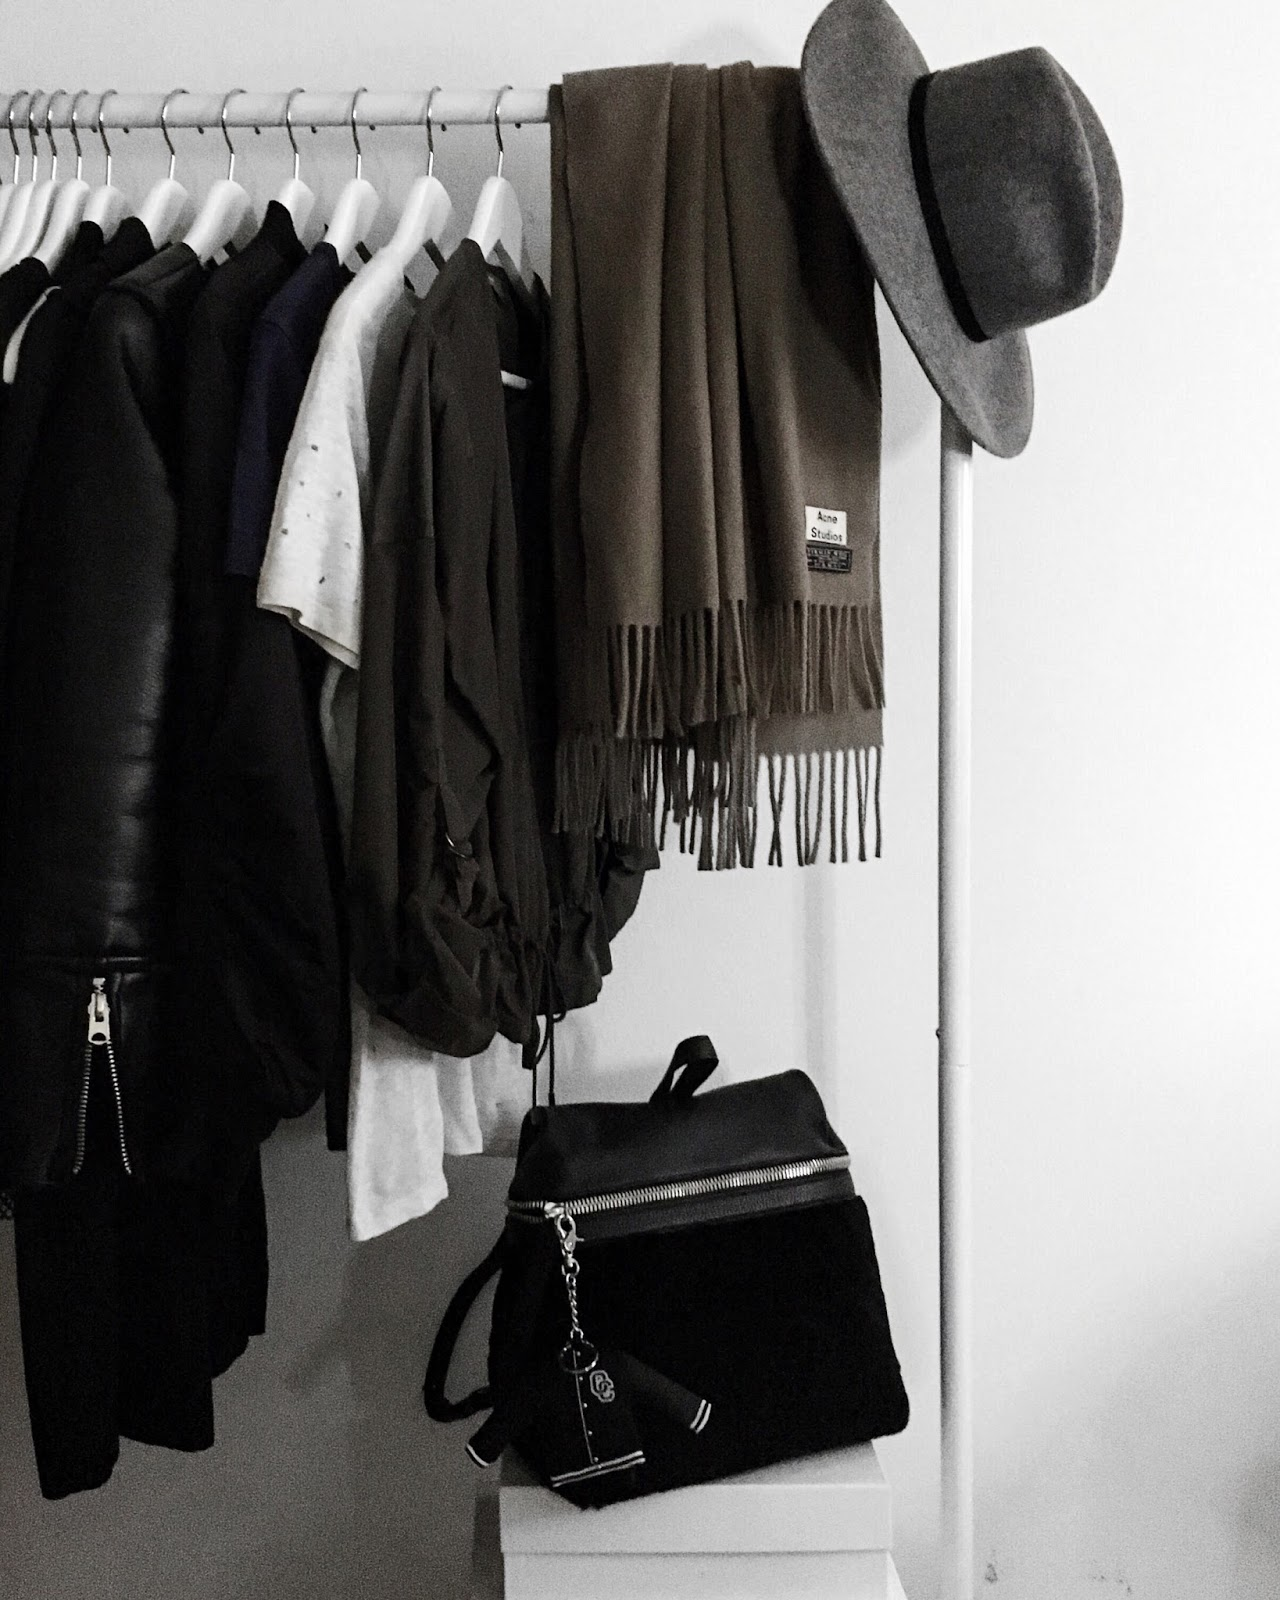 New in: KARA Backpack in Black Leather/Shearling - missjesf.